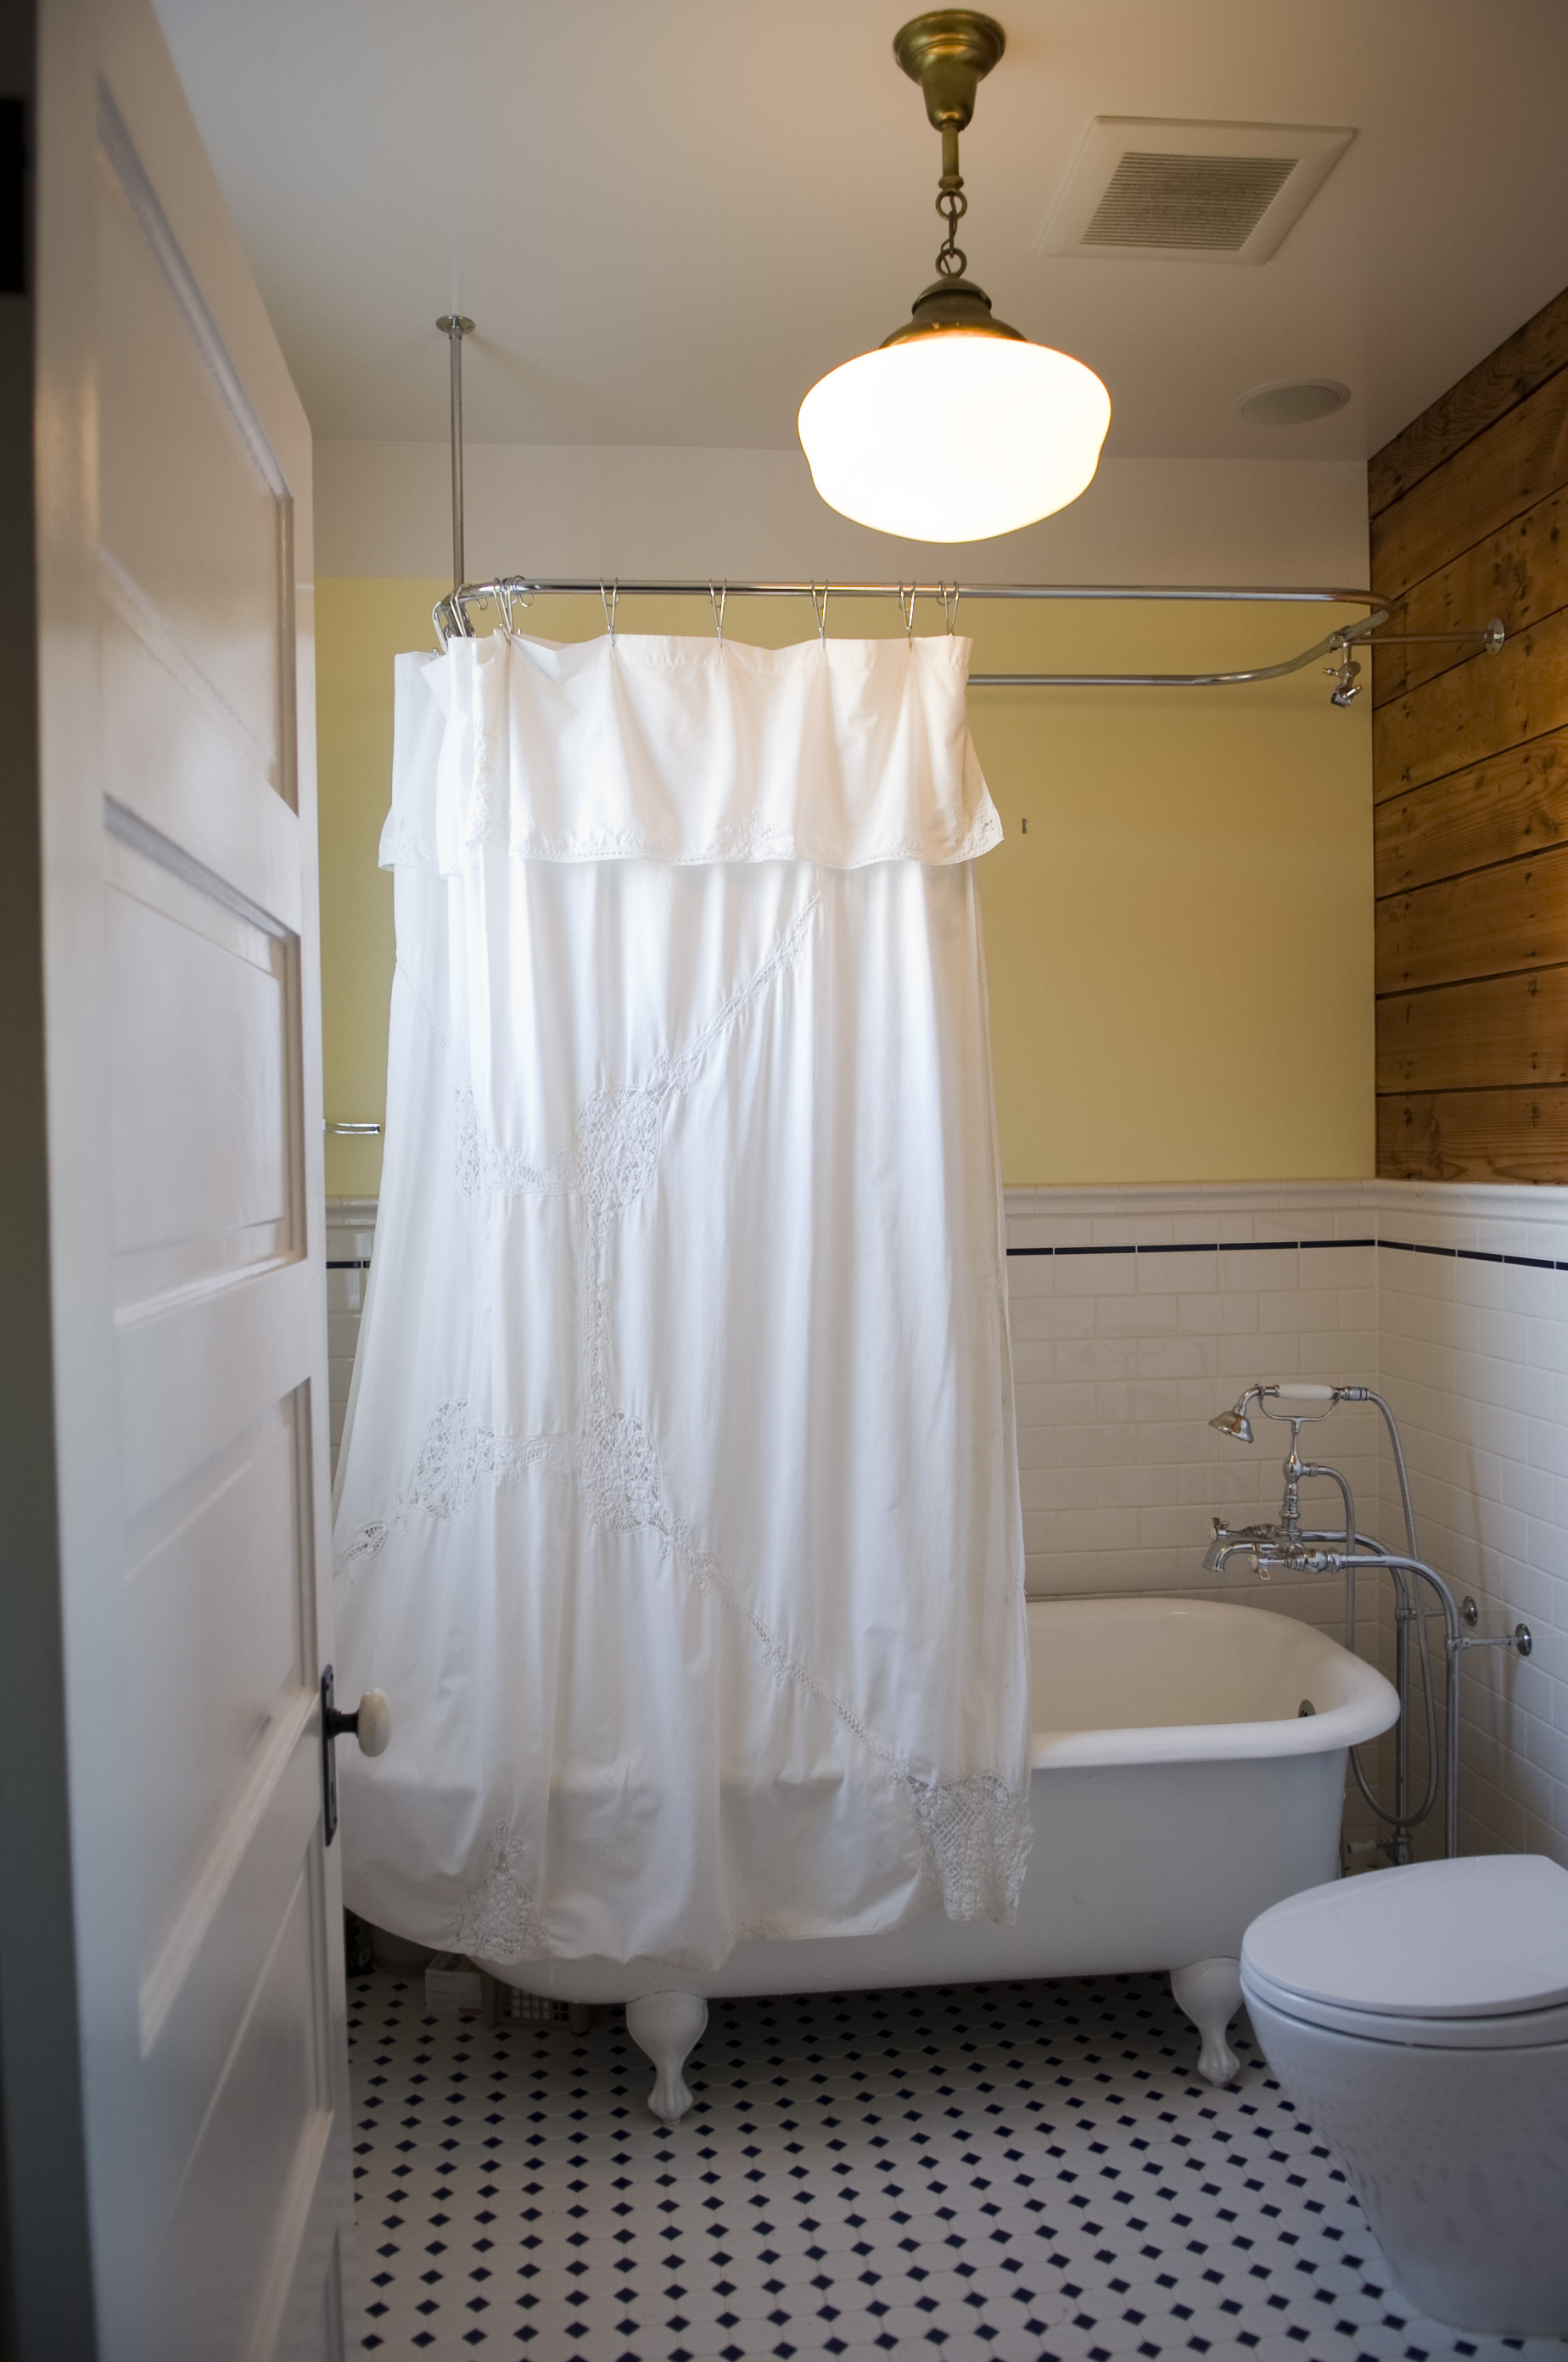 Copy of Leber Residence - Main Bath After.jpg